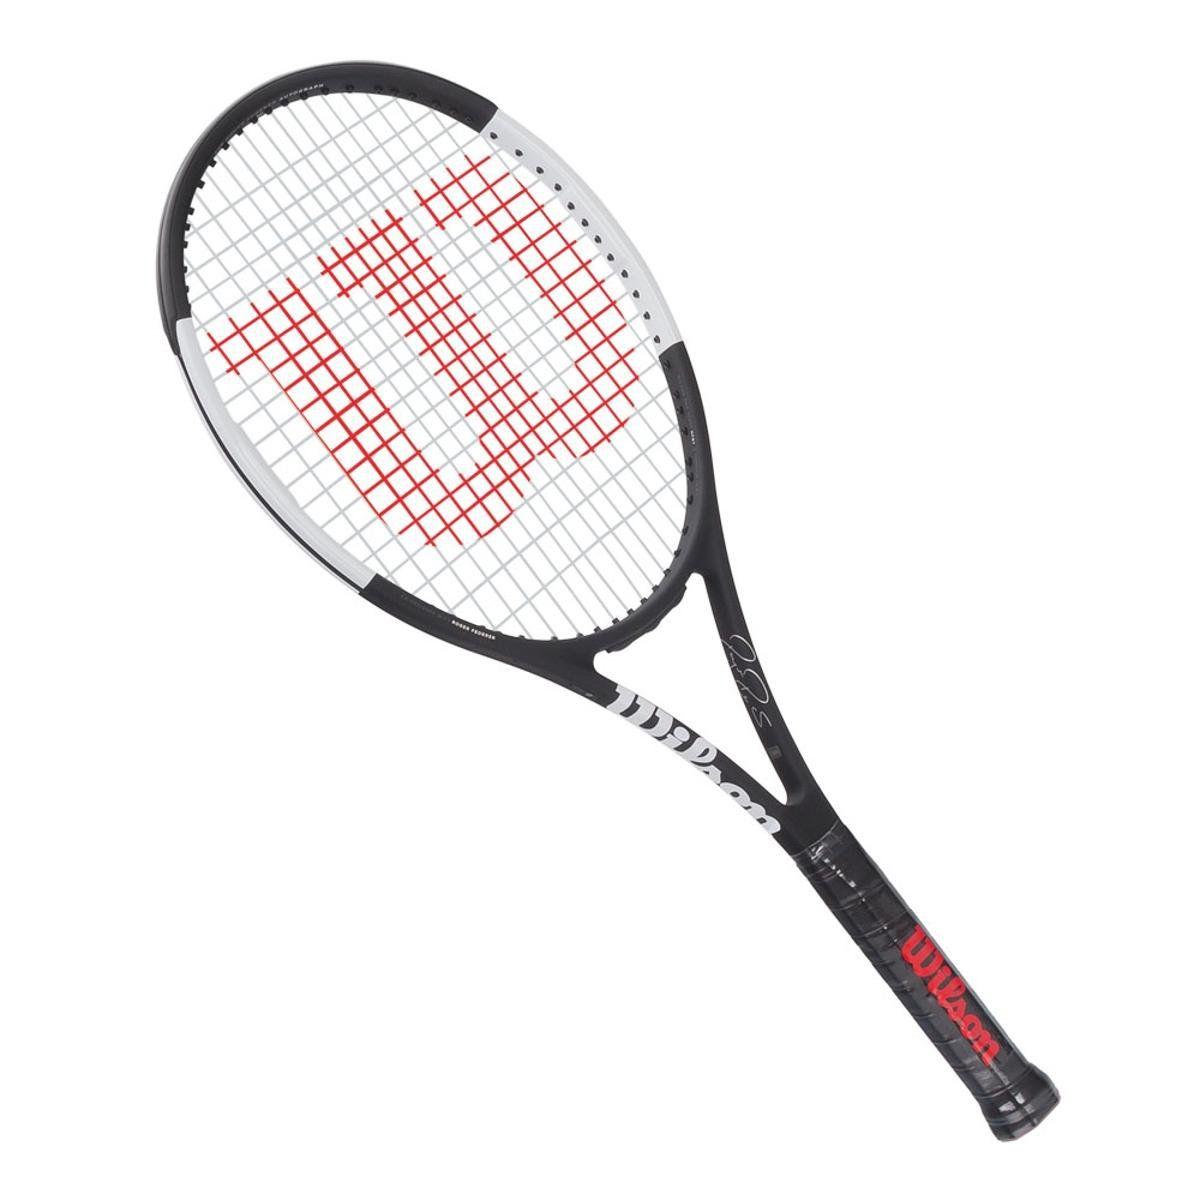 Raquete de Tenis Wilson Pro Staff RF 97 Autograph Preta/Branca